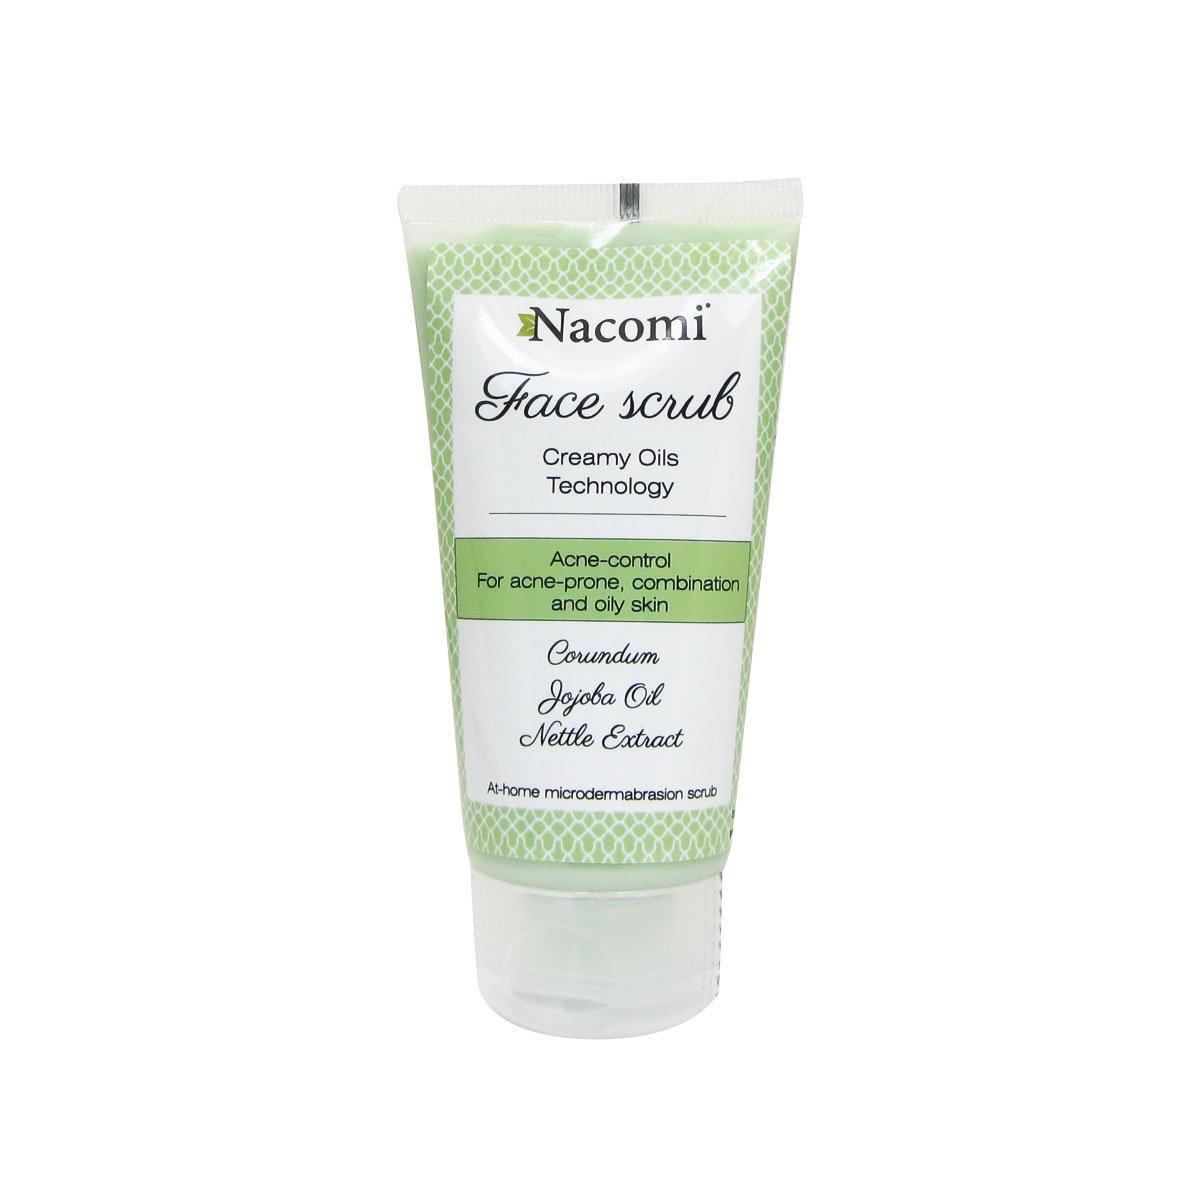 Scrub viso anti-acne Nacomi Olio di Jojoba Ortica Peeling pulizia pelle mista grassa 85 ml